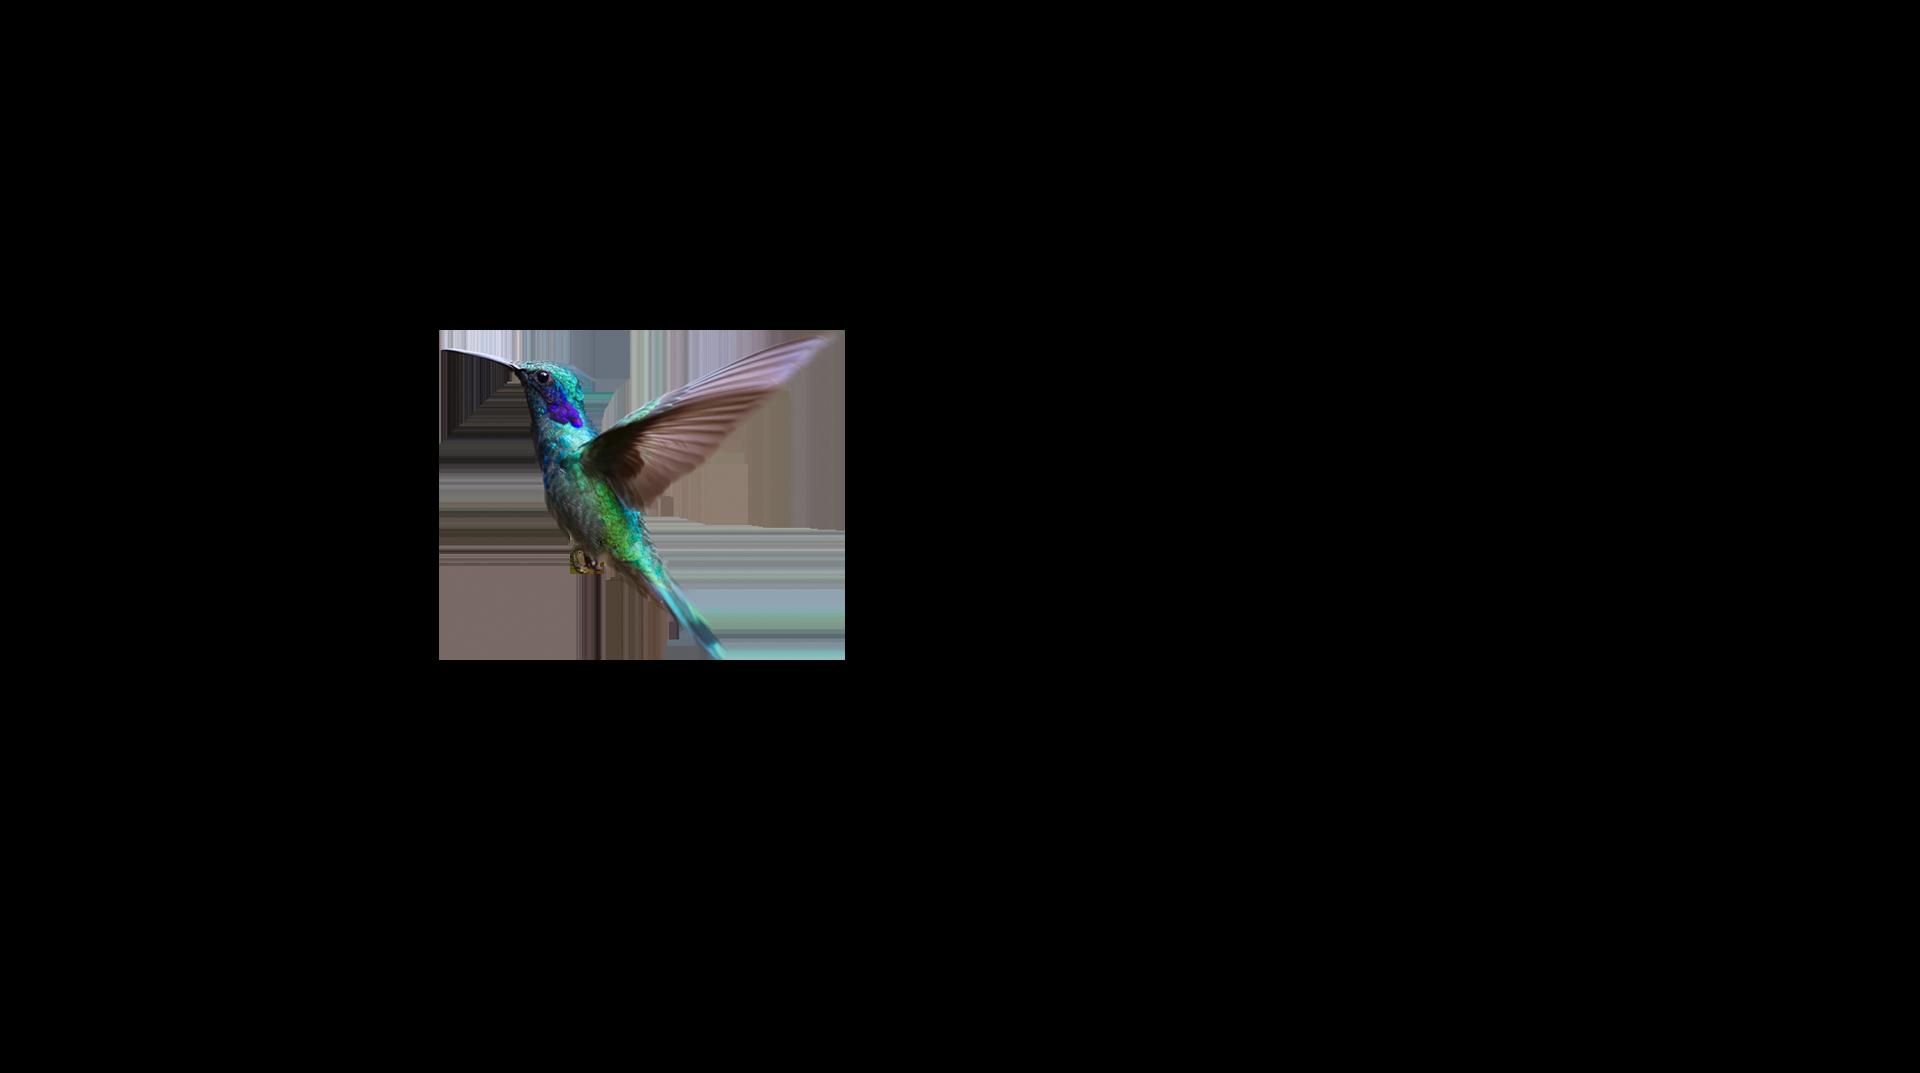 Bird Picutre